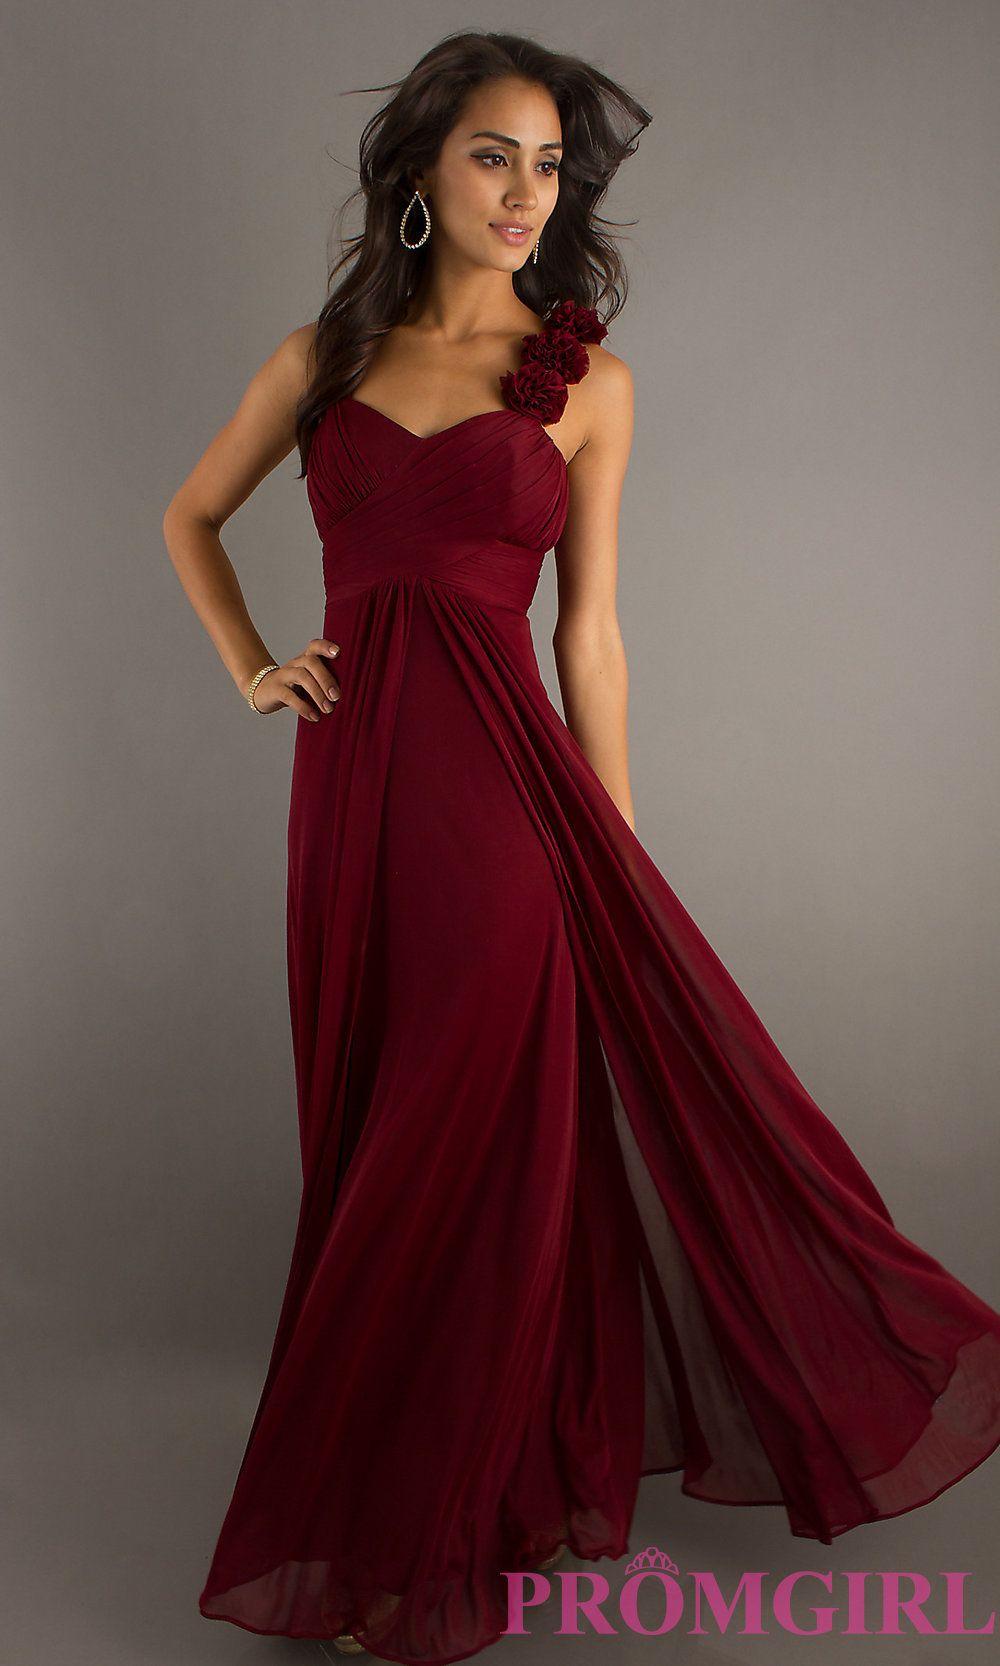 Pin by miranda on prom dresses pinterest bridesmaid dresses